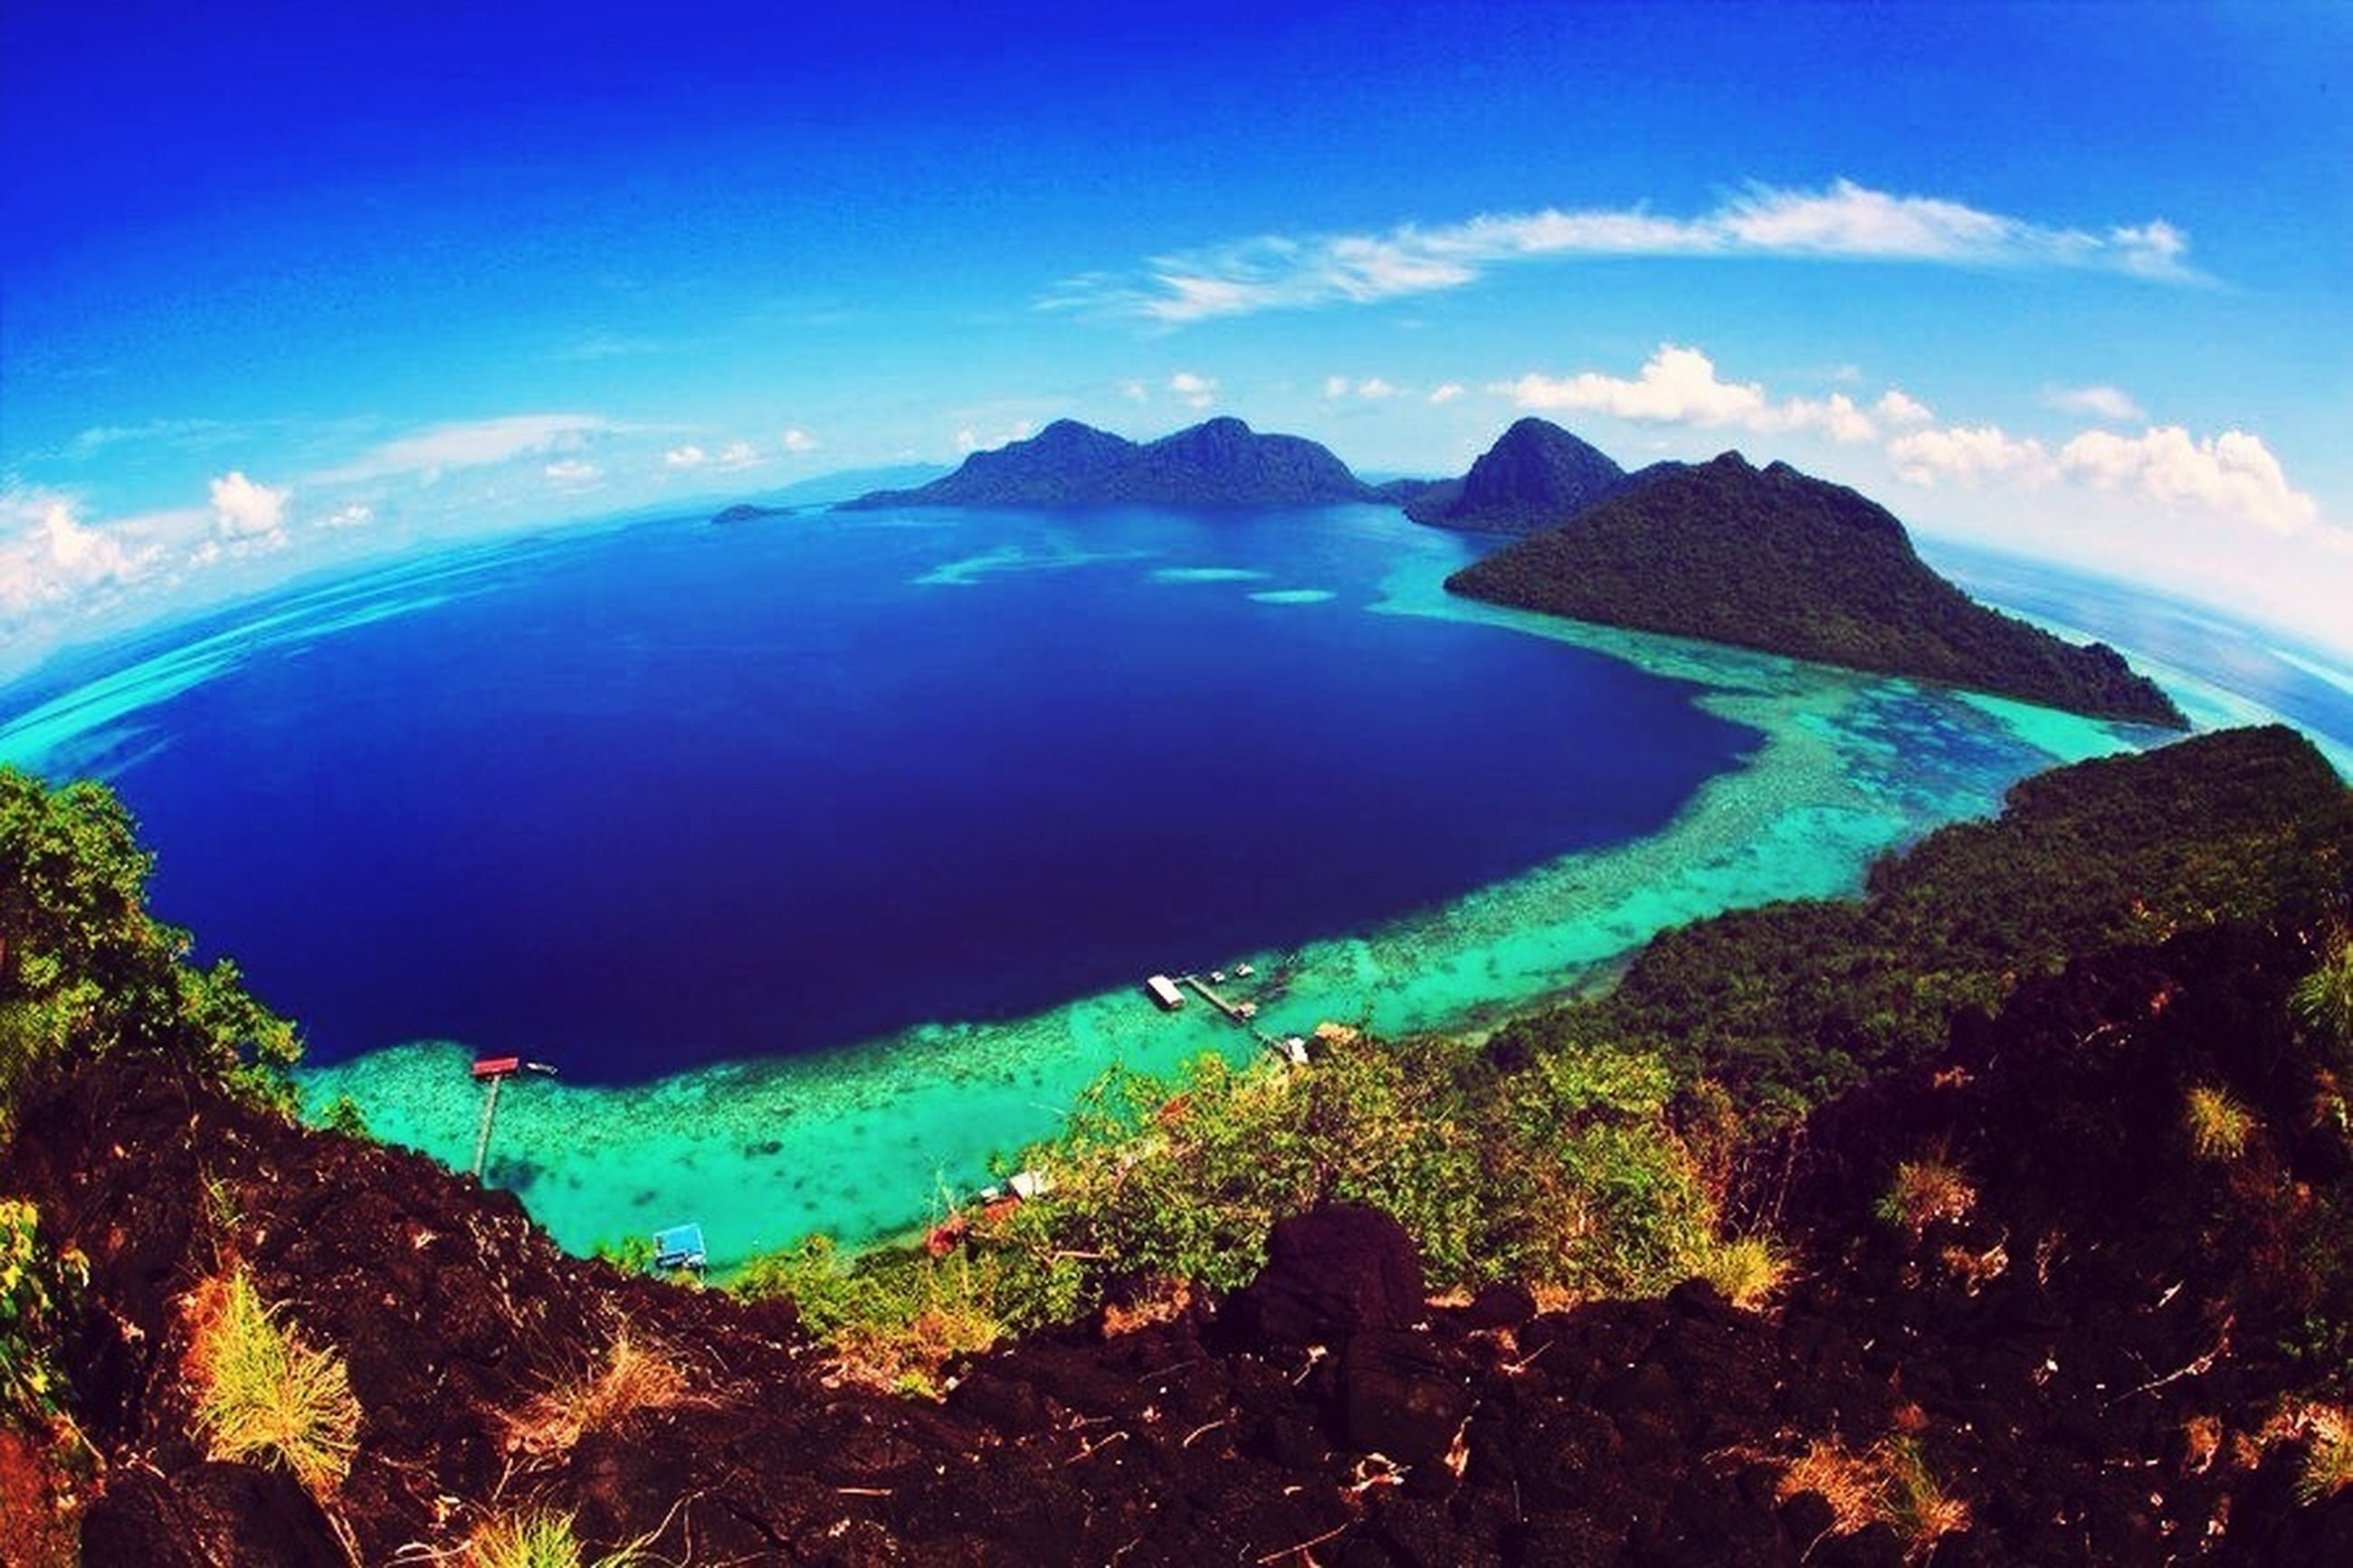 sea, water, blue, scenics, tranquil scene, sky, tranquility, beauty in nature, nature, horizon over water, idyllic, mountain, cloud - sky, cloud, non-urban scene, coastline, sunlight, rock formation, landscape, rock - object